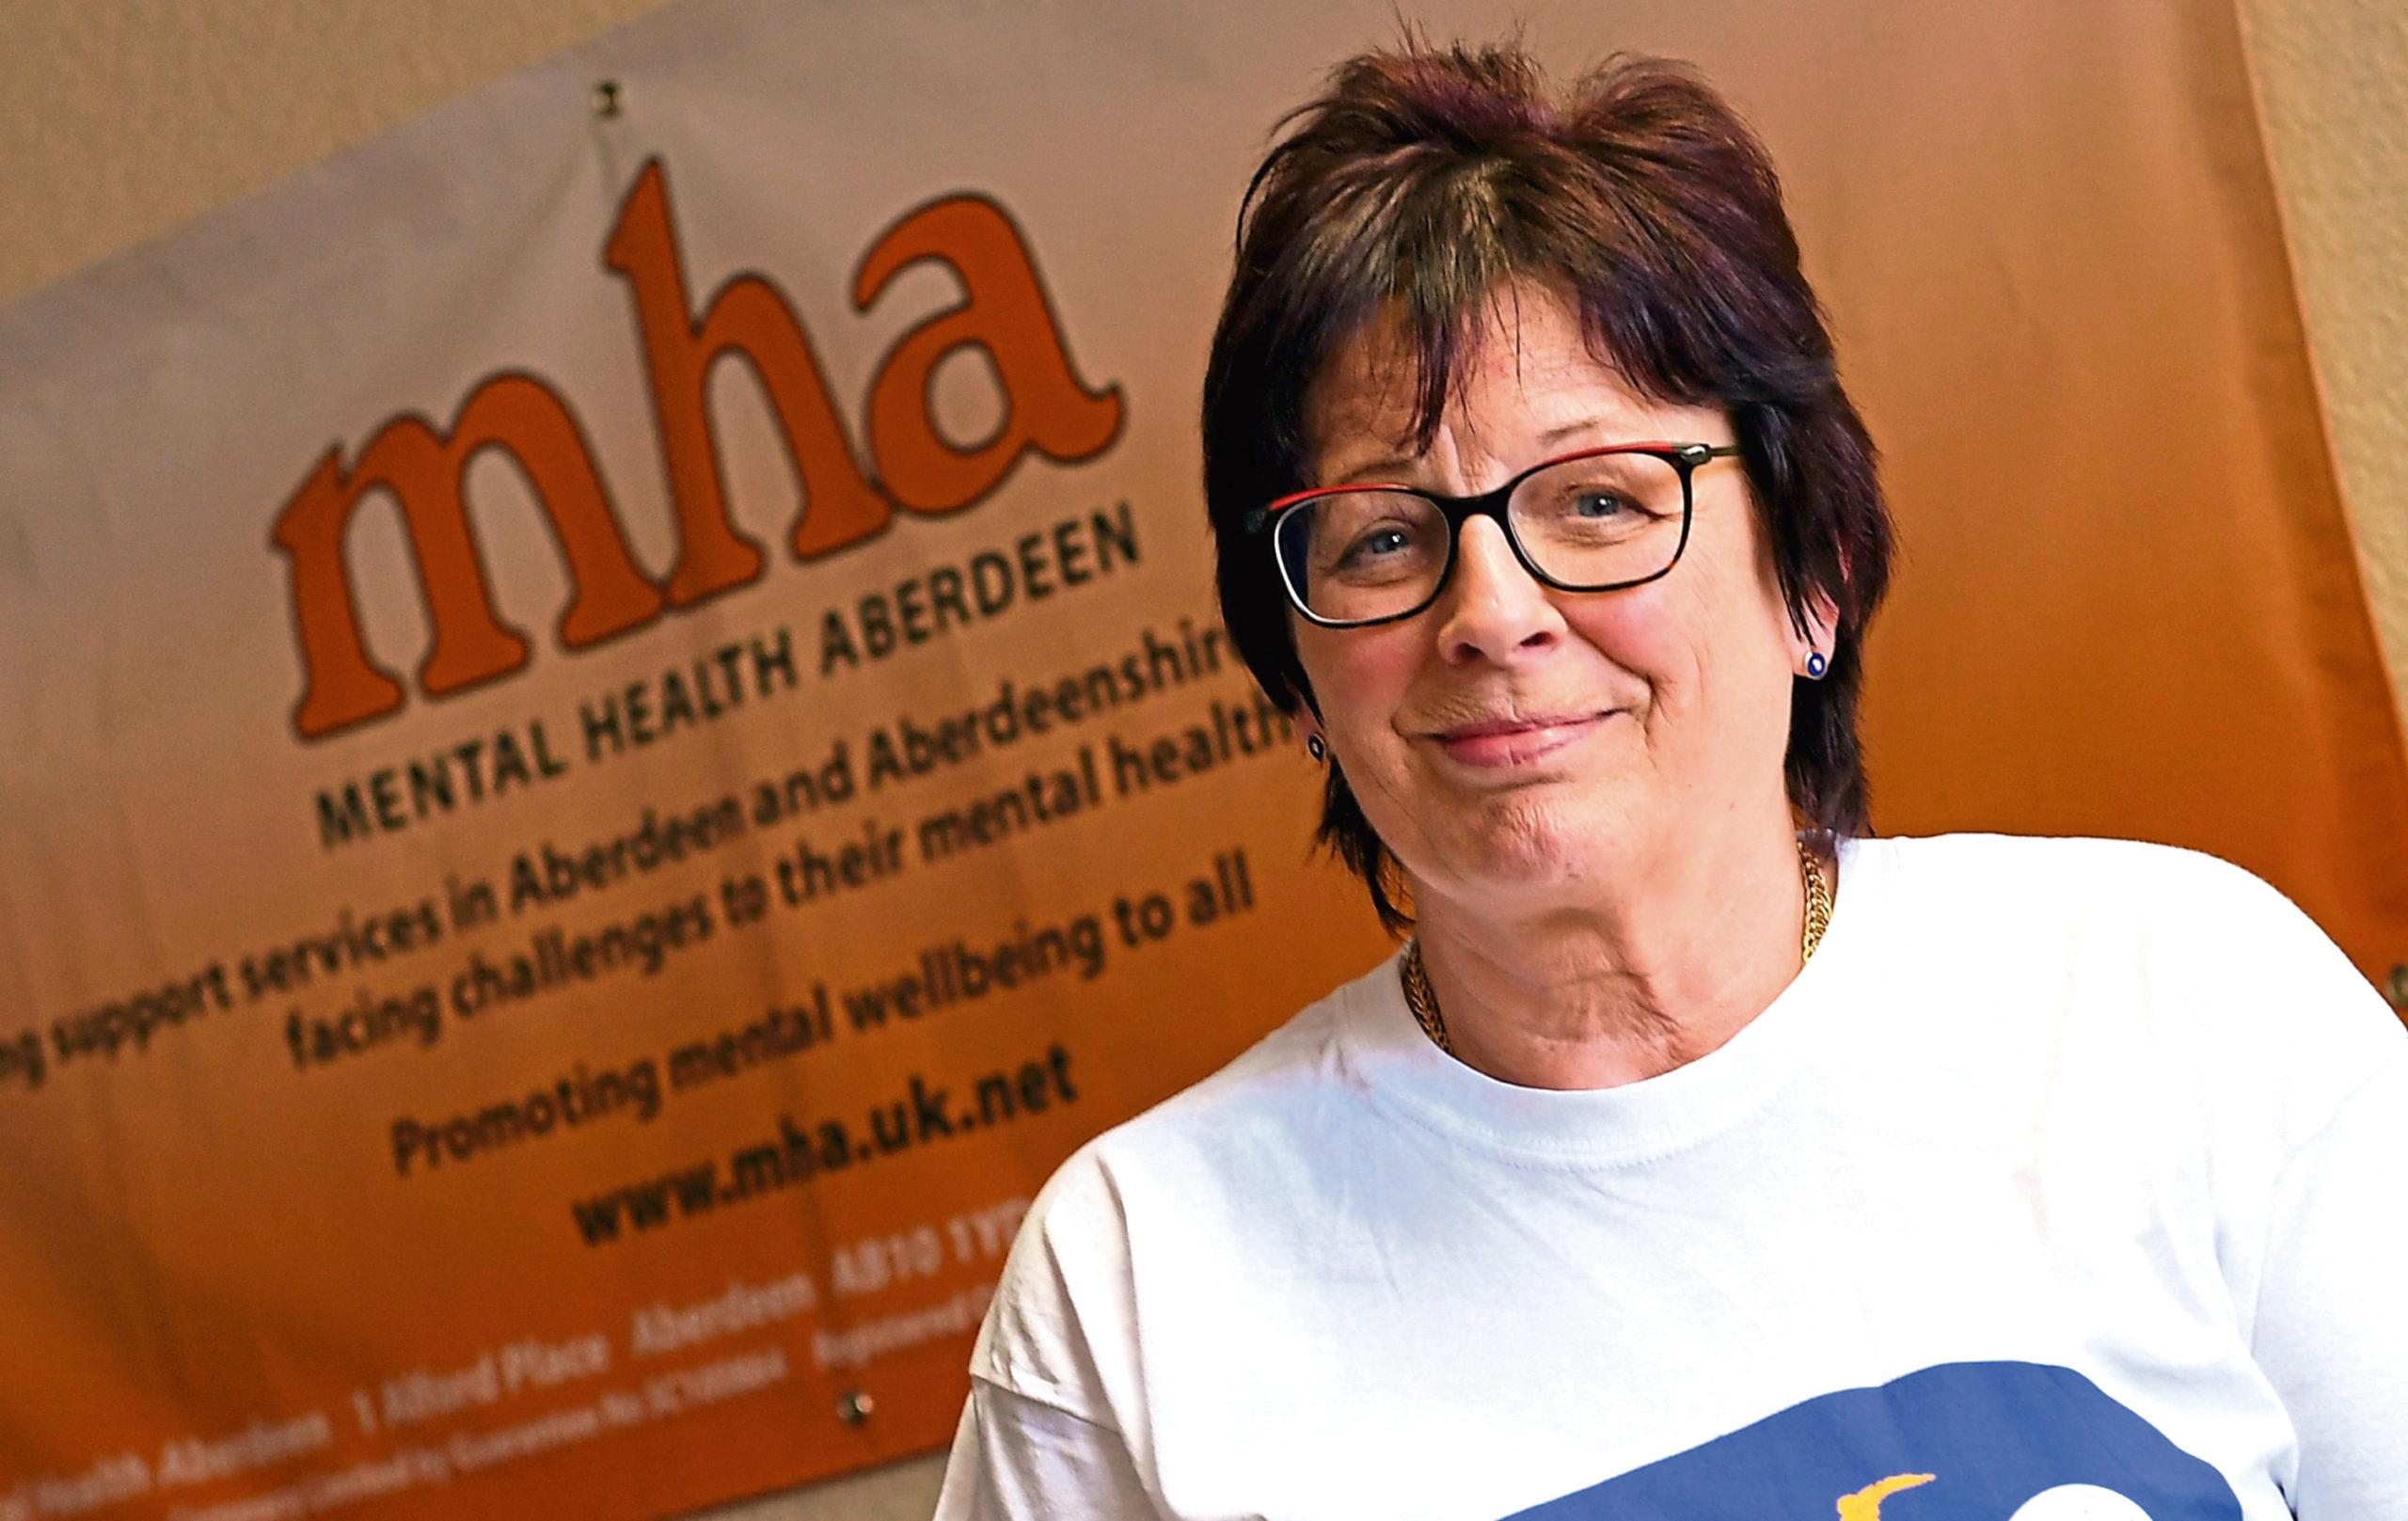 Mental Health Aberdeen  chief, Astrid Whyte